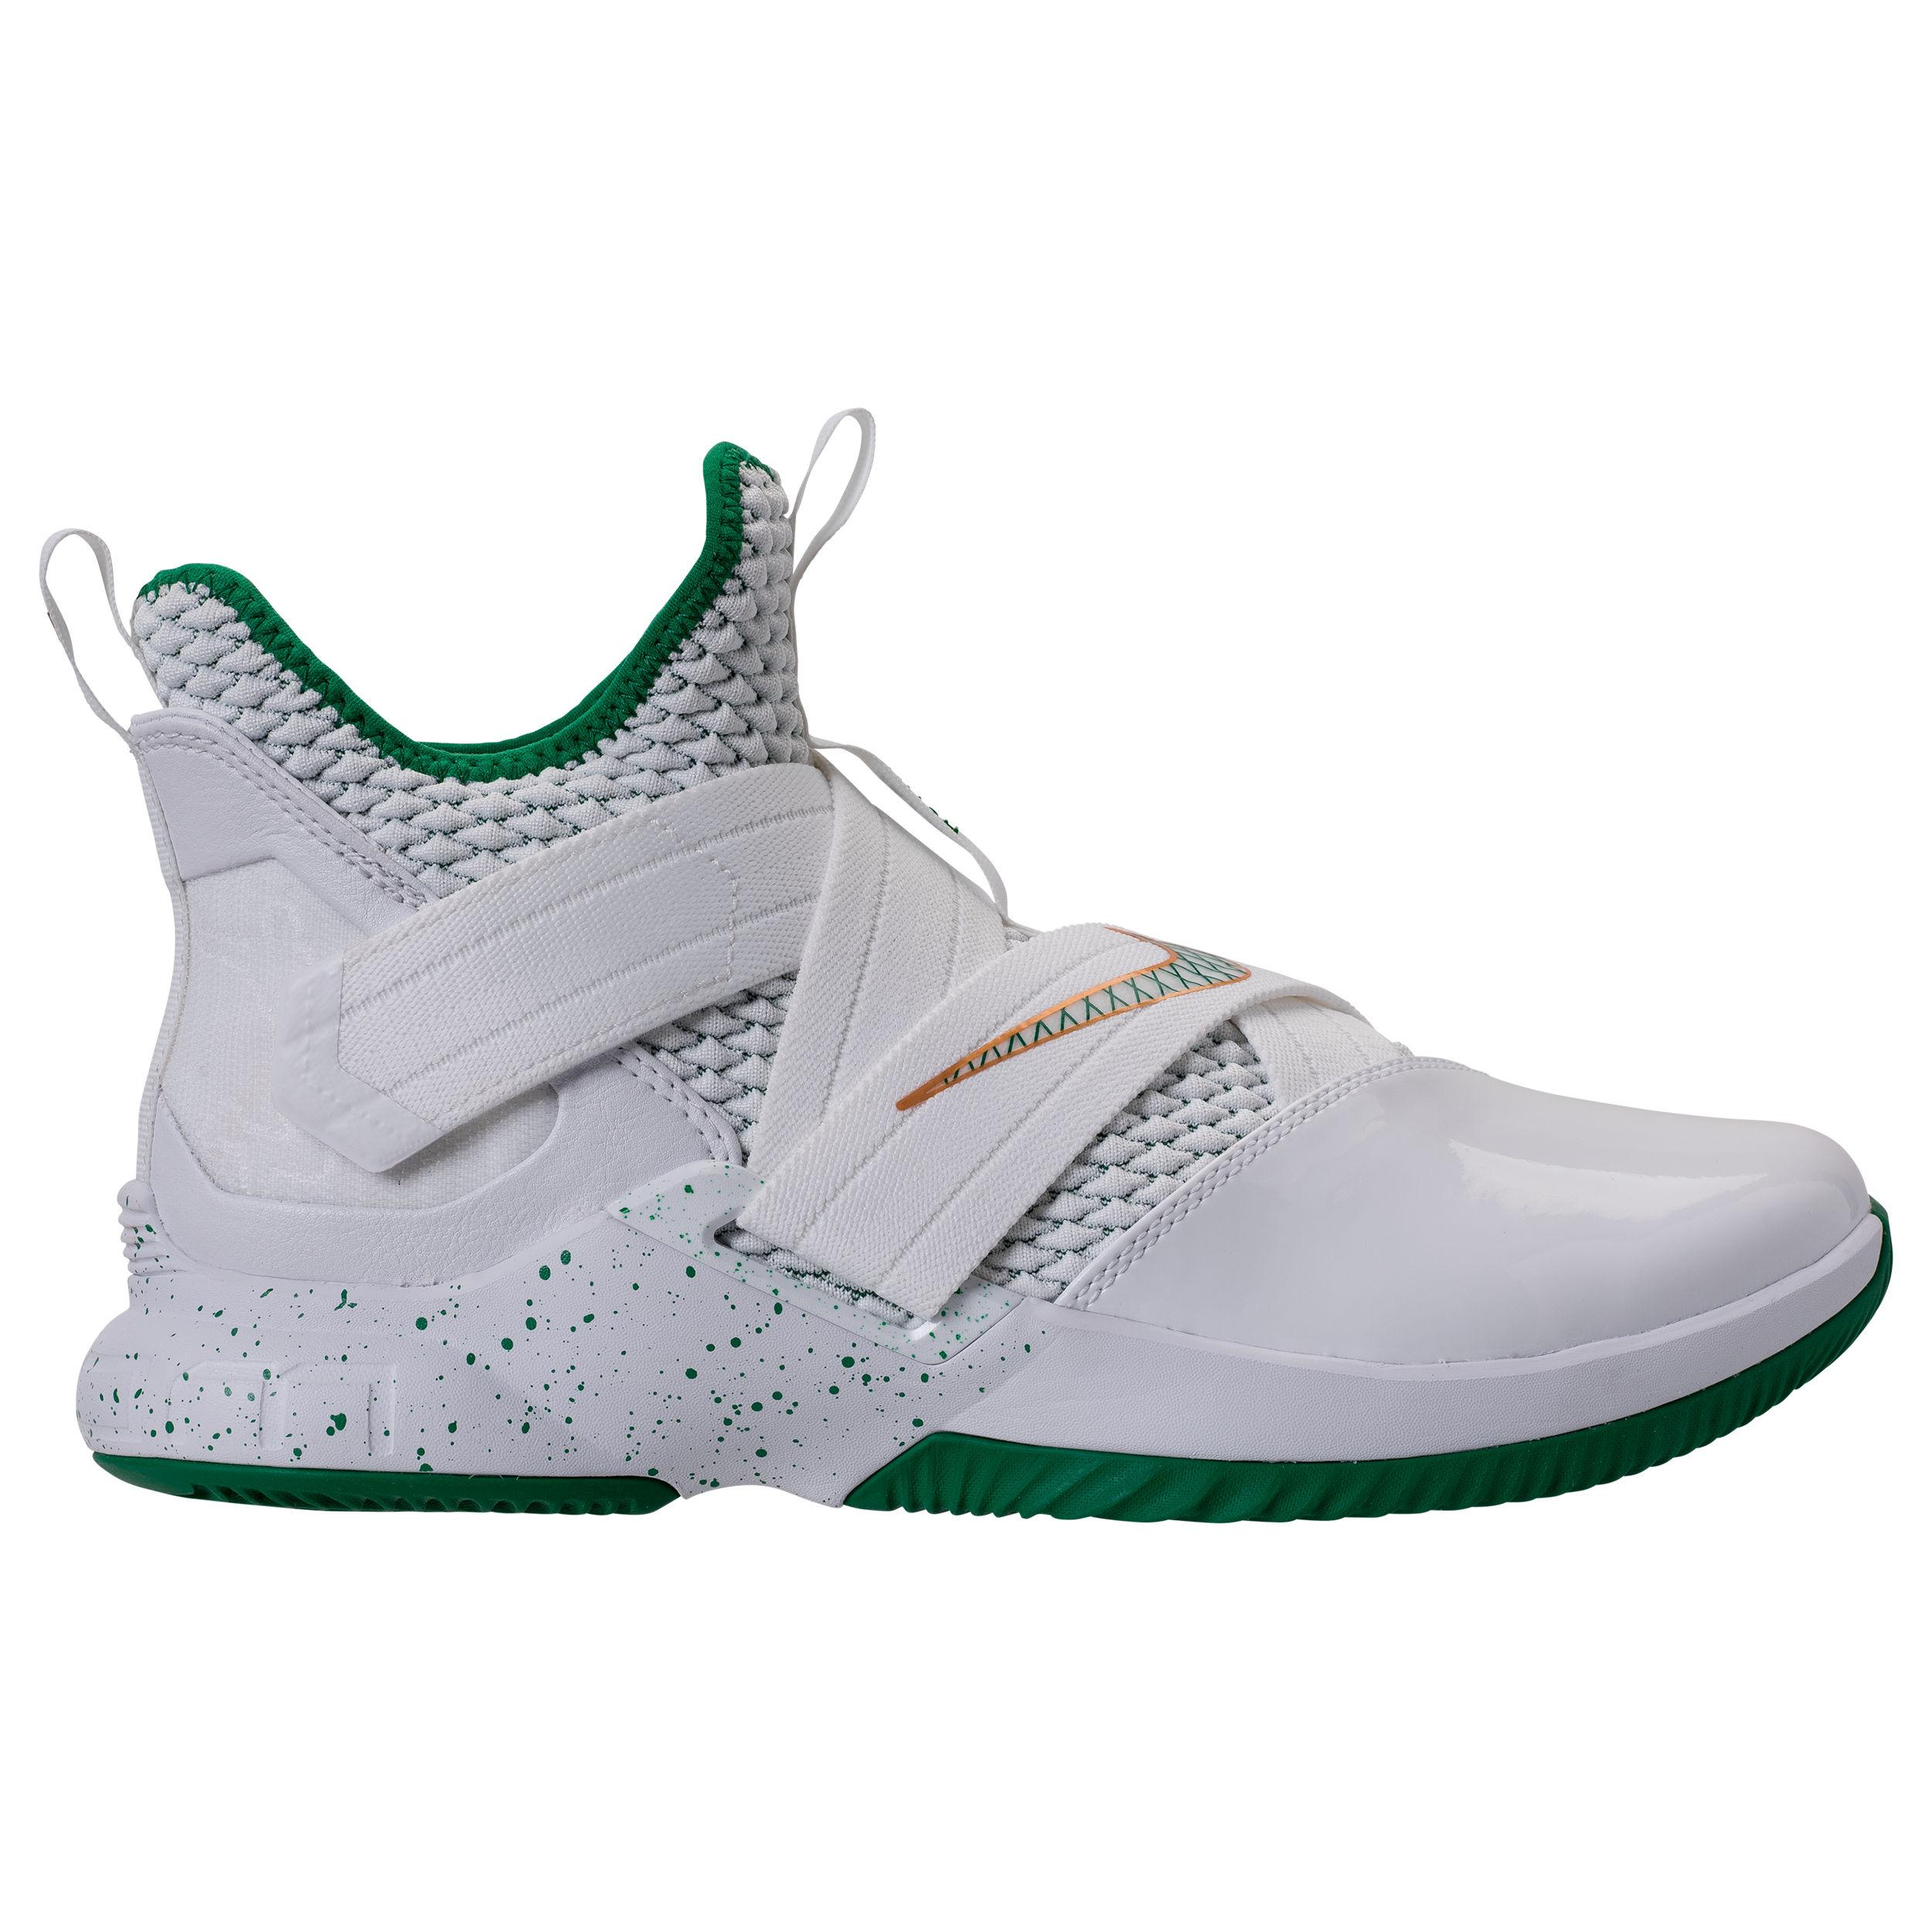 Nike LeBron Soldier 12 SVSM 3